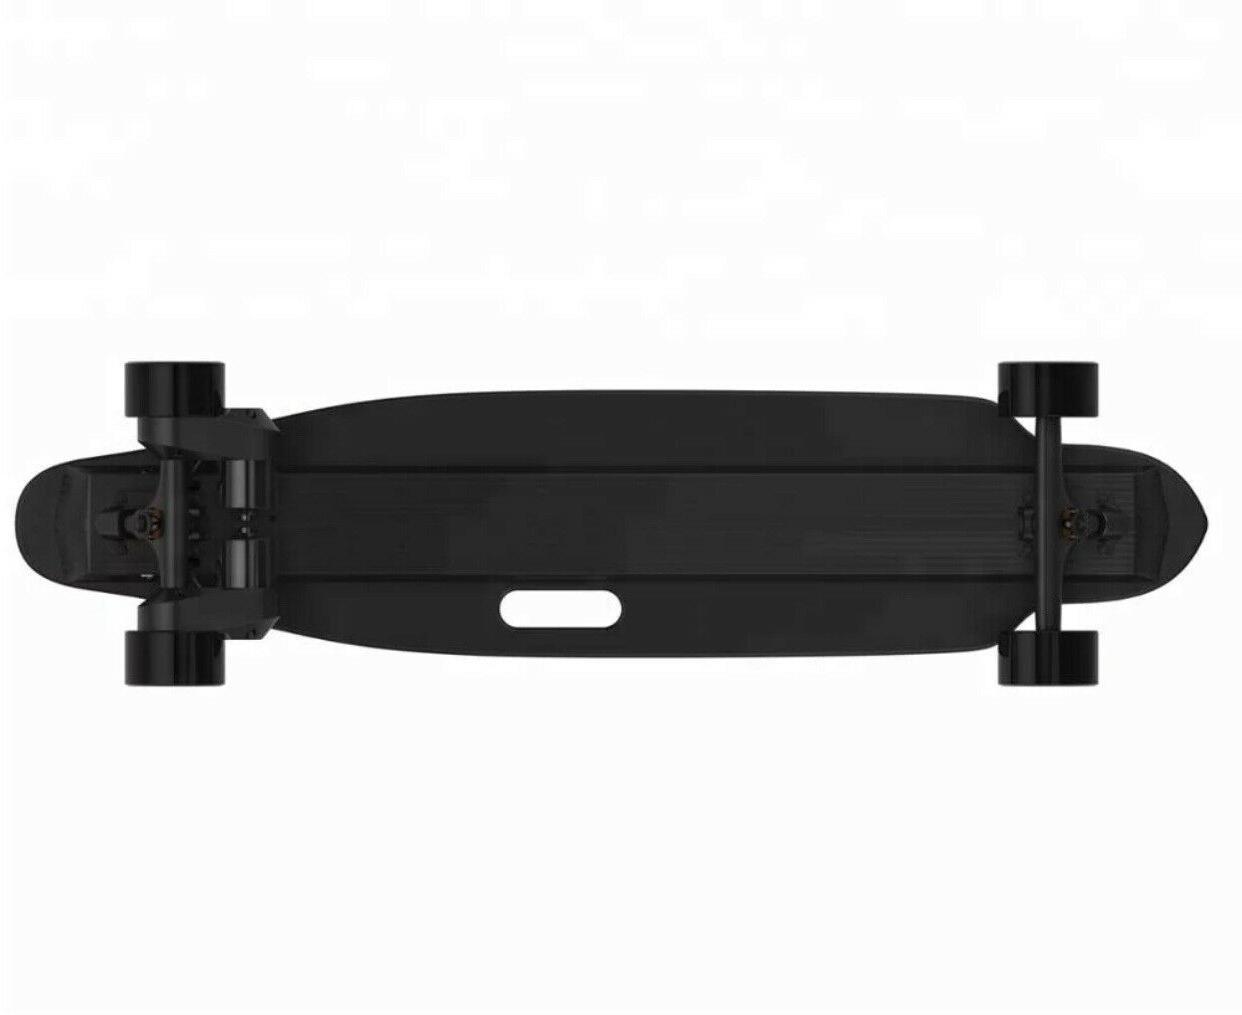 2019 2000w Double Electric Skates